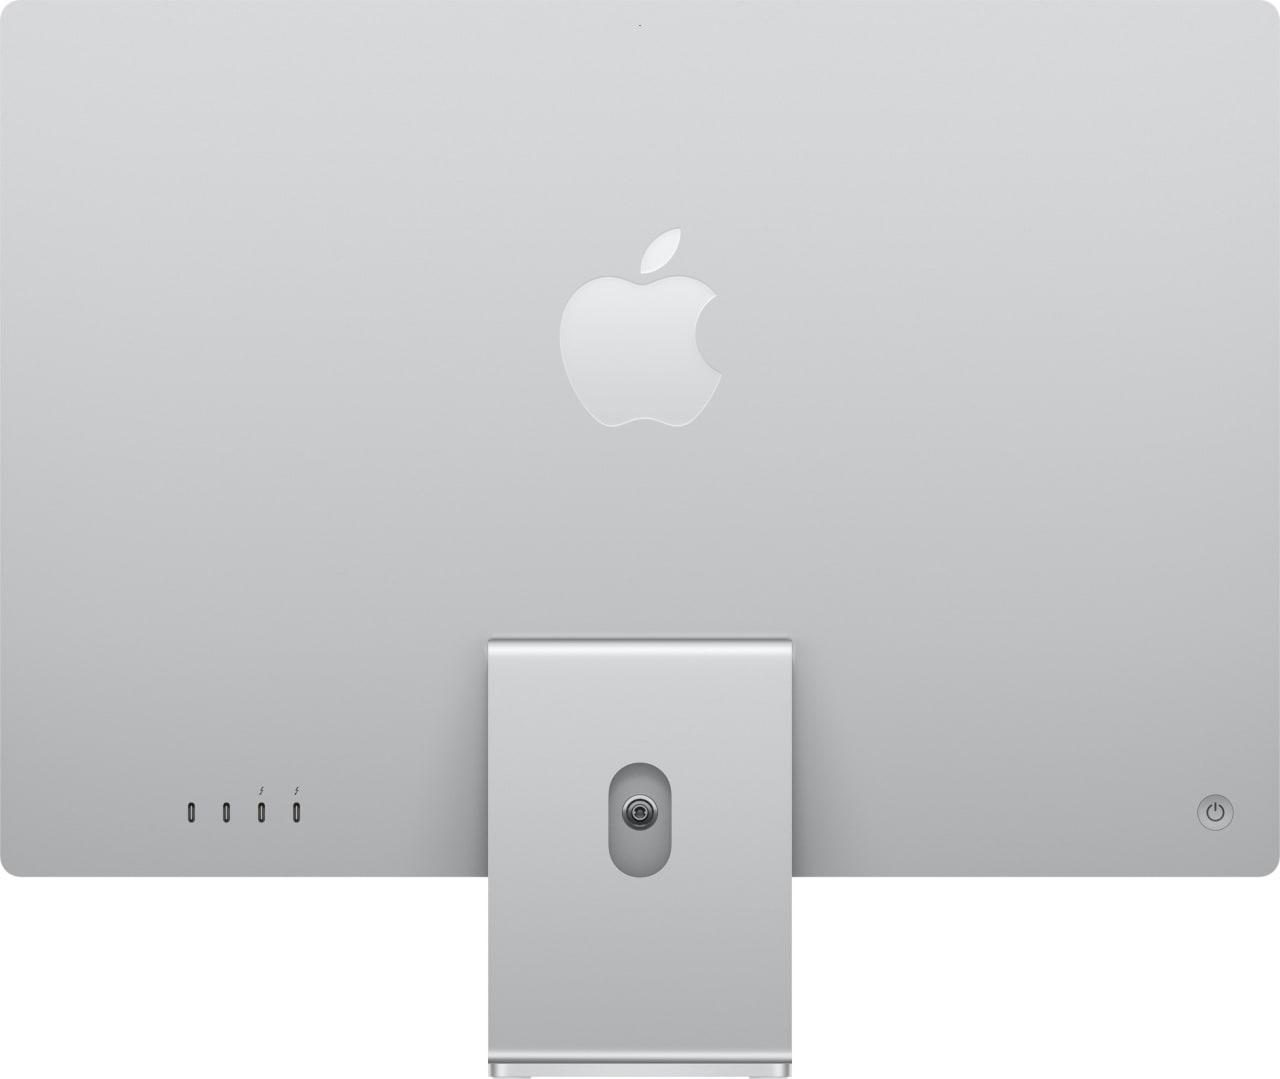 "Silver Apple 24"" iMac (Mid 2021) All-in-One - Apple M1 - 8GB - 512GB SSD - Apple Integrated 8-core GPU.3"